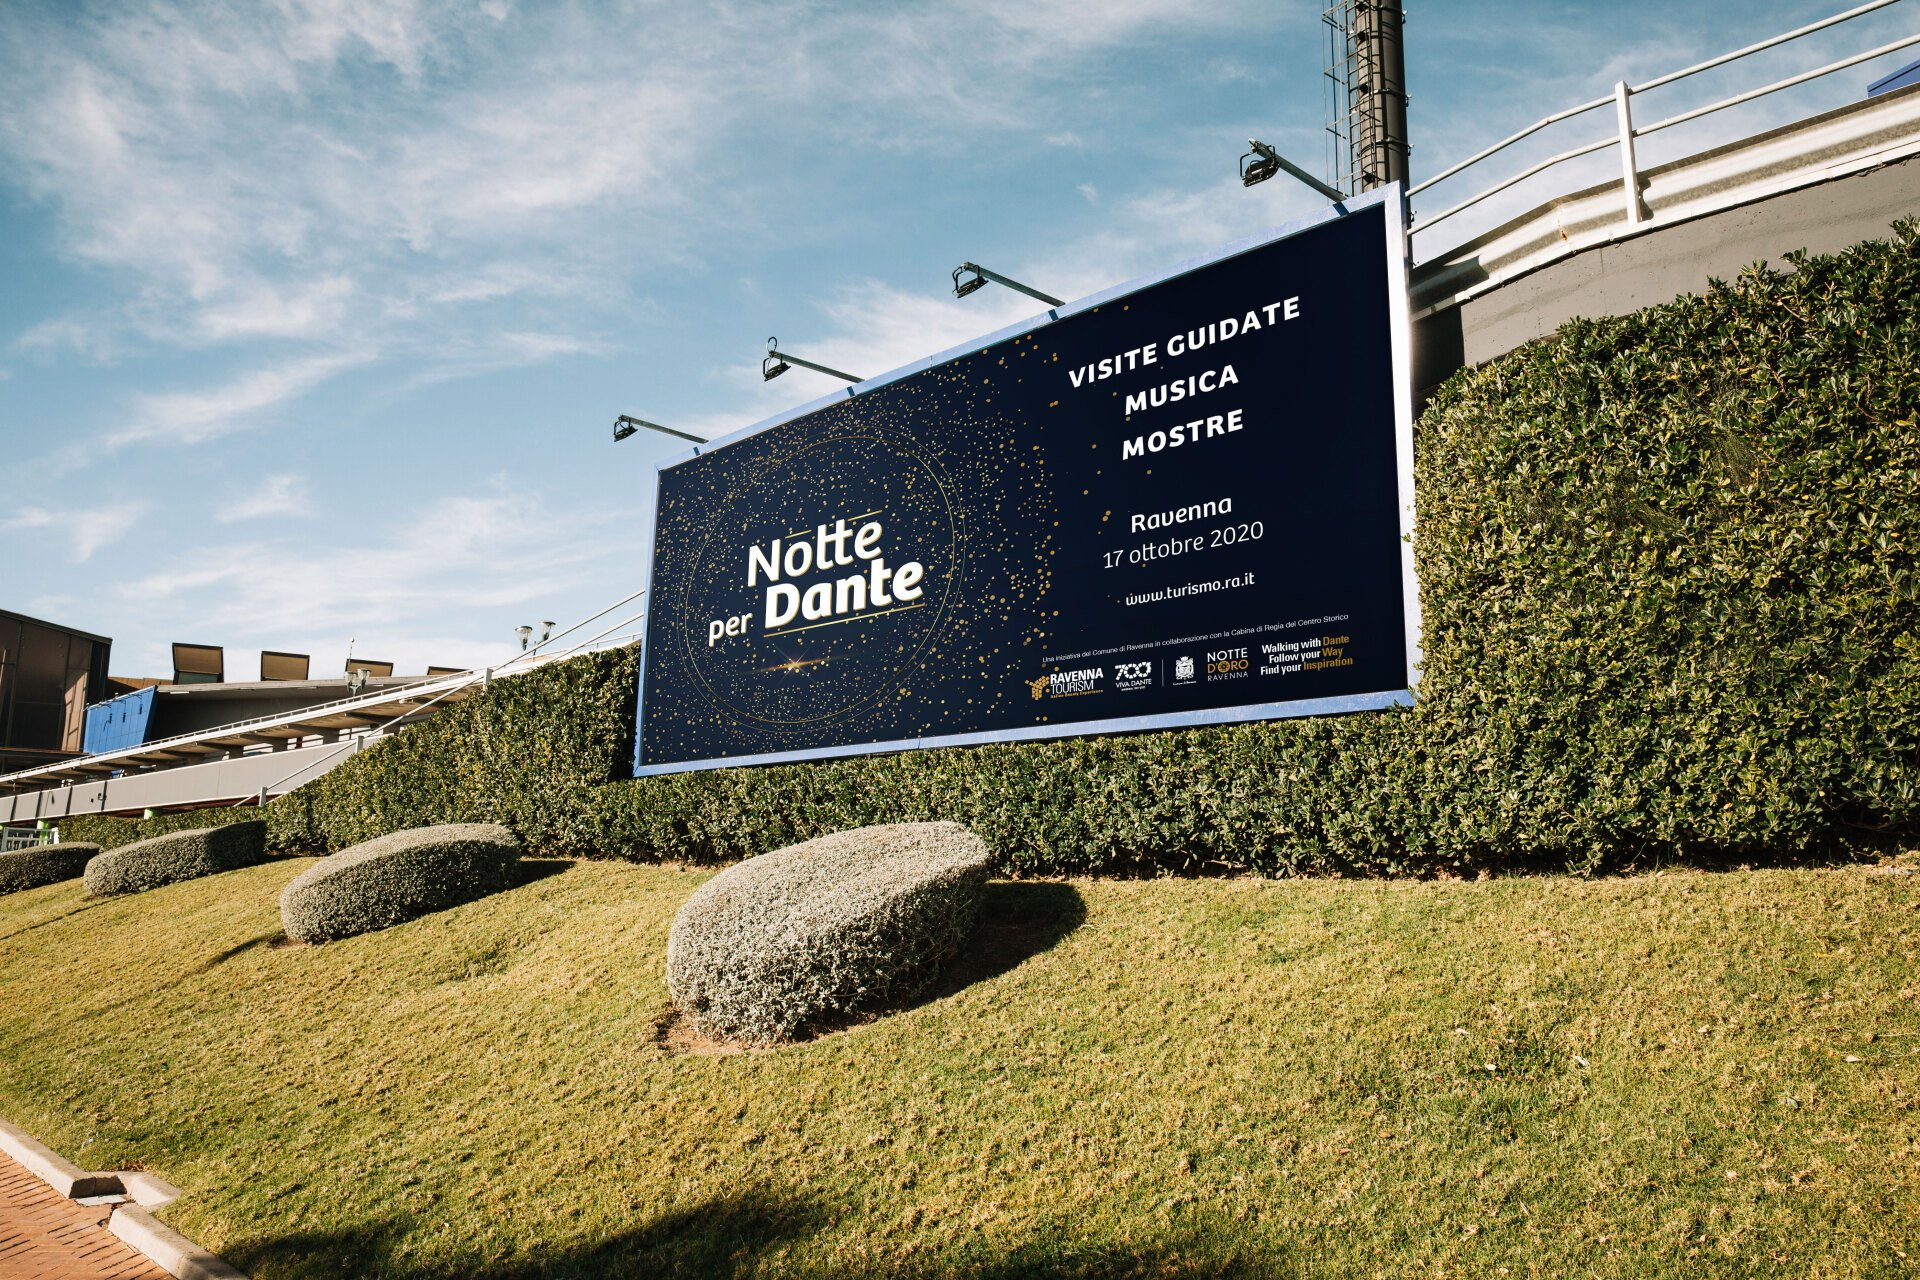 Notte per Dante - Ravenna Tourism